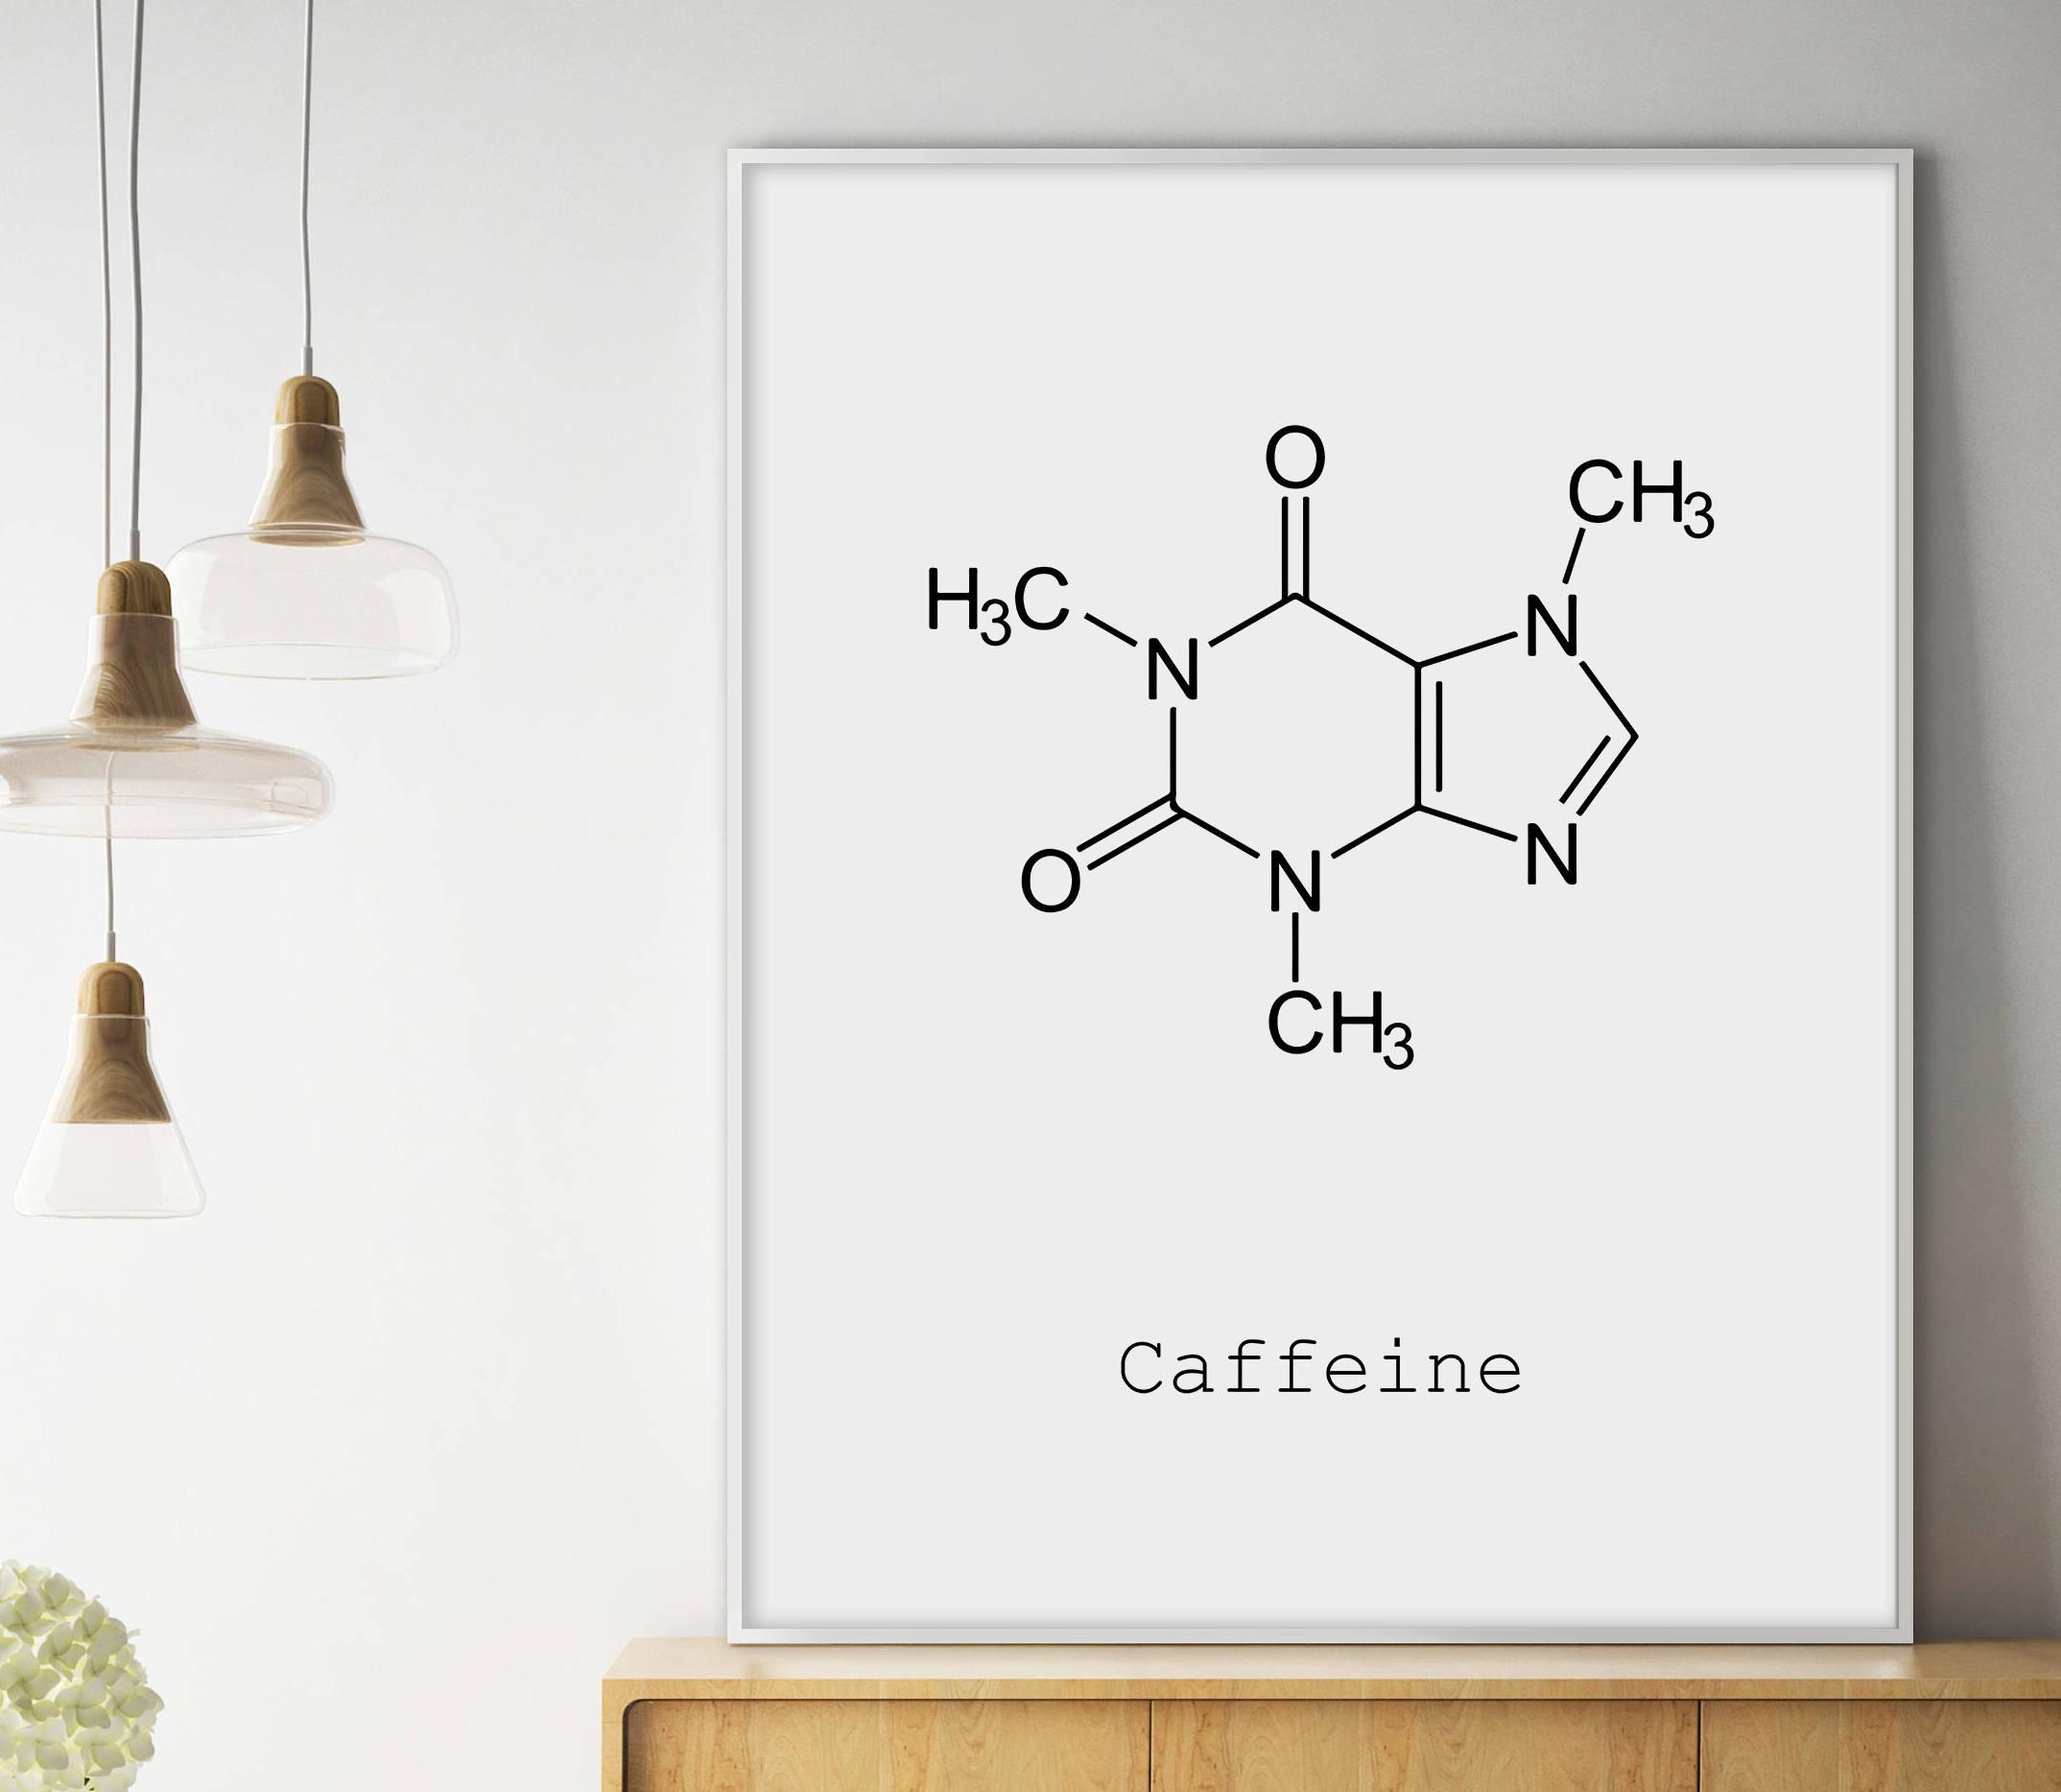 caffeine molecule poster example